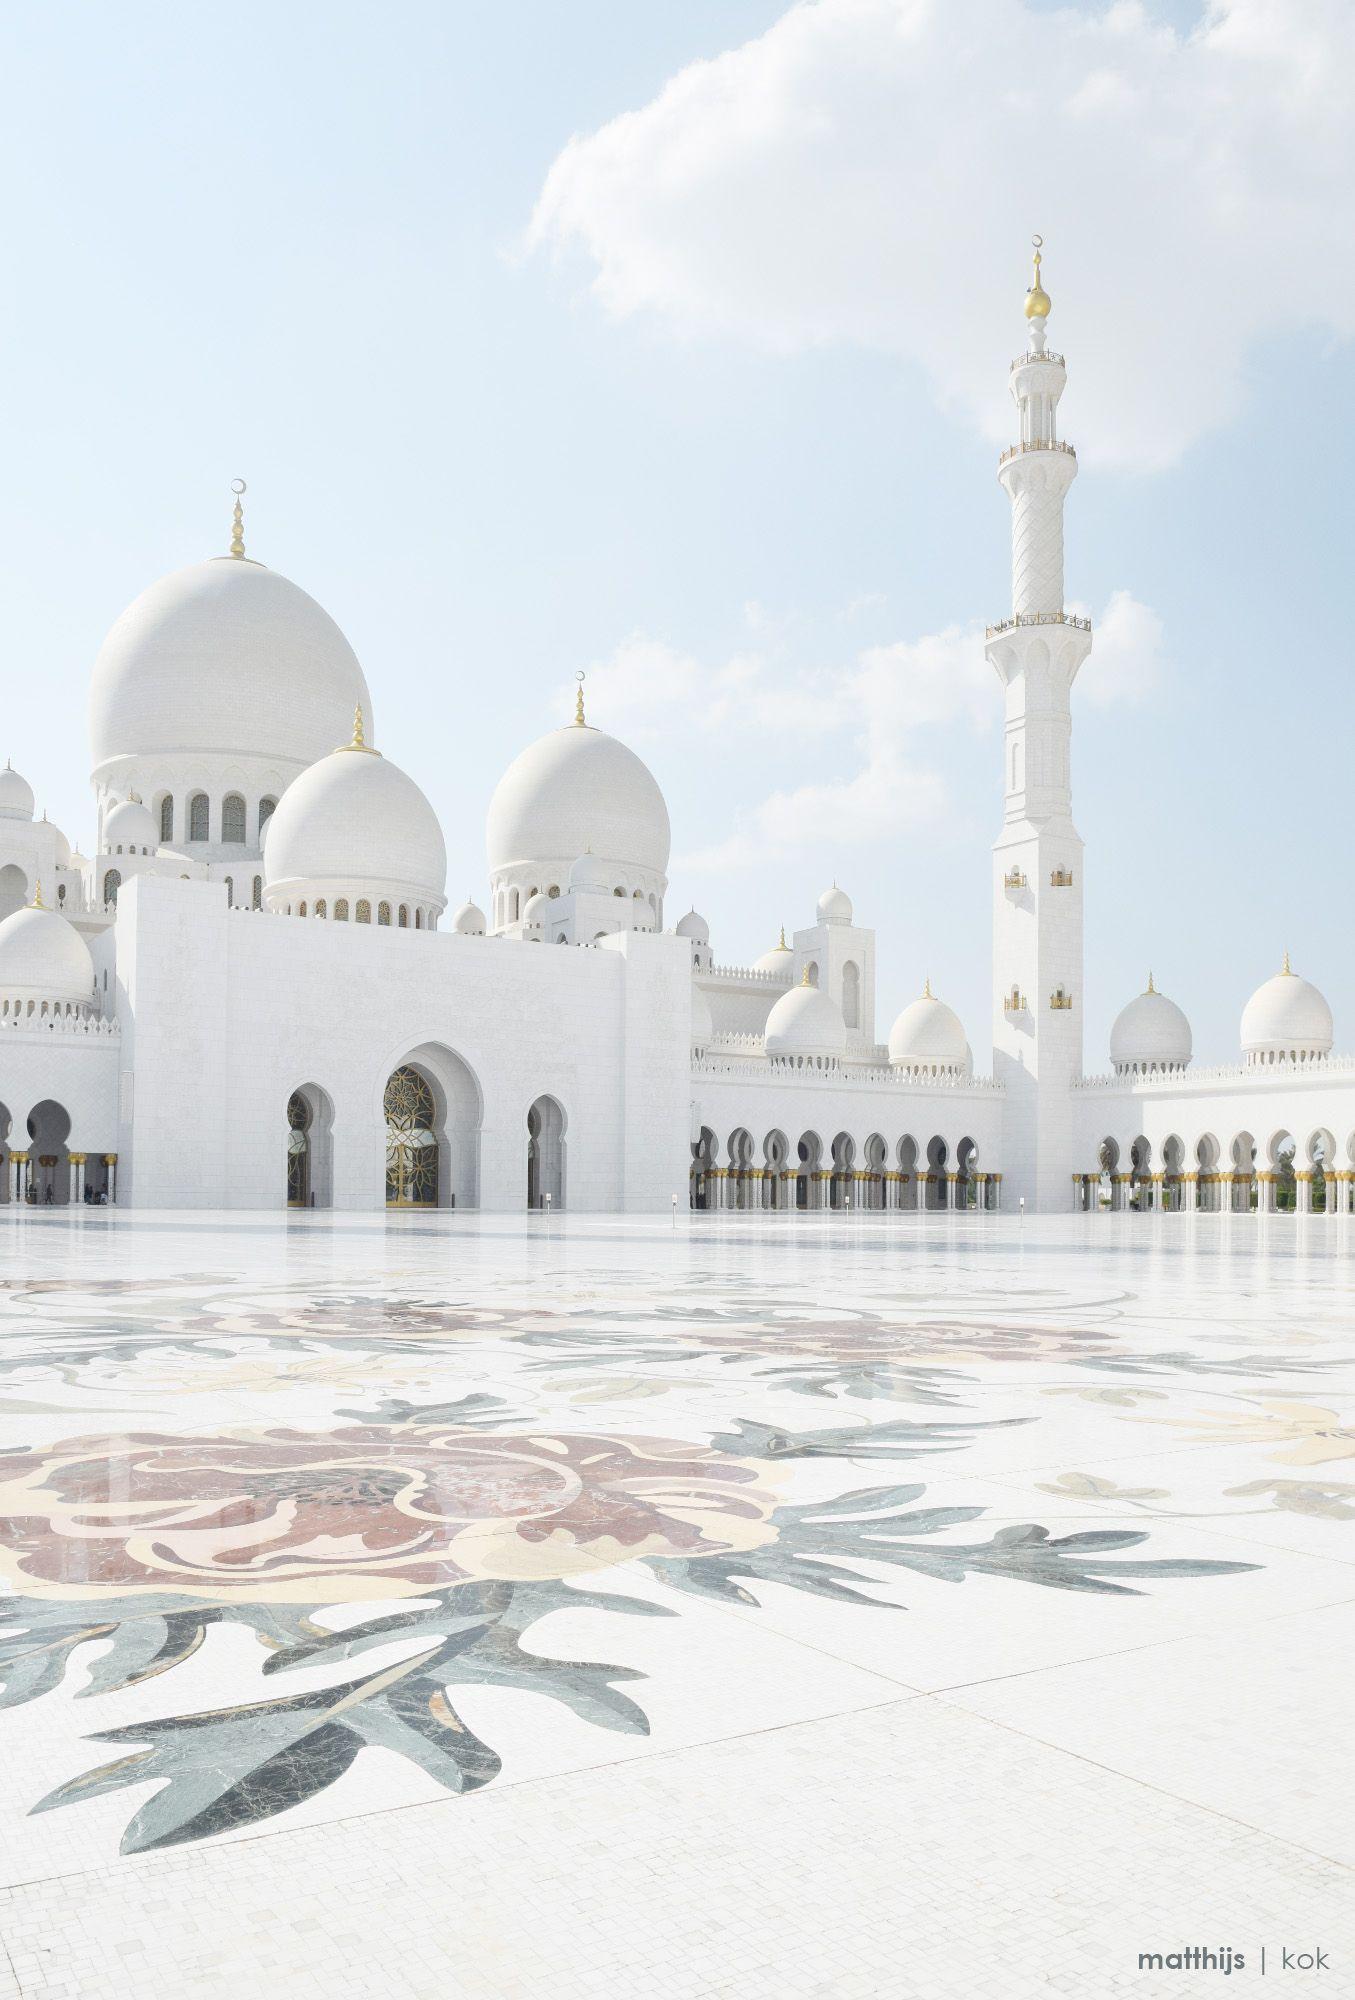 Sheikh Zayed Grand Mosque Abu Dhabi Uae Photo By Matthijs Kok